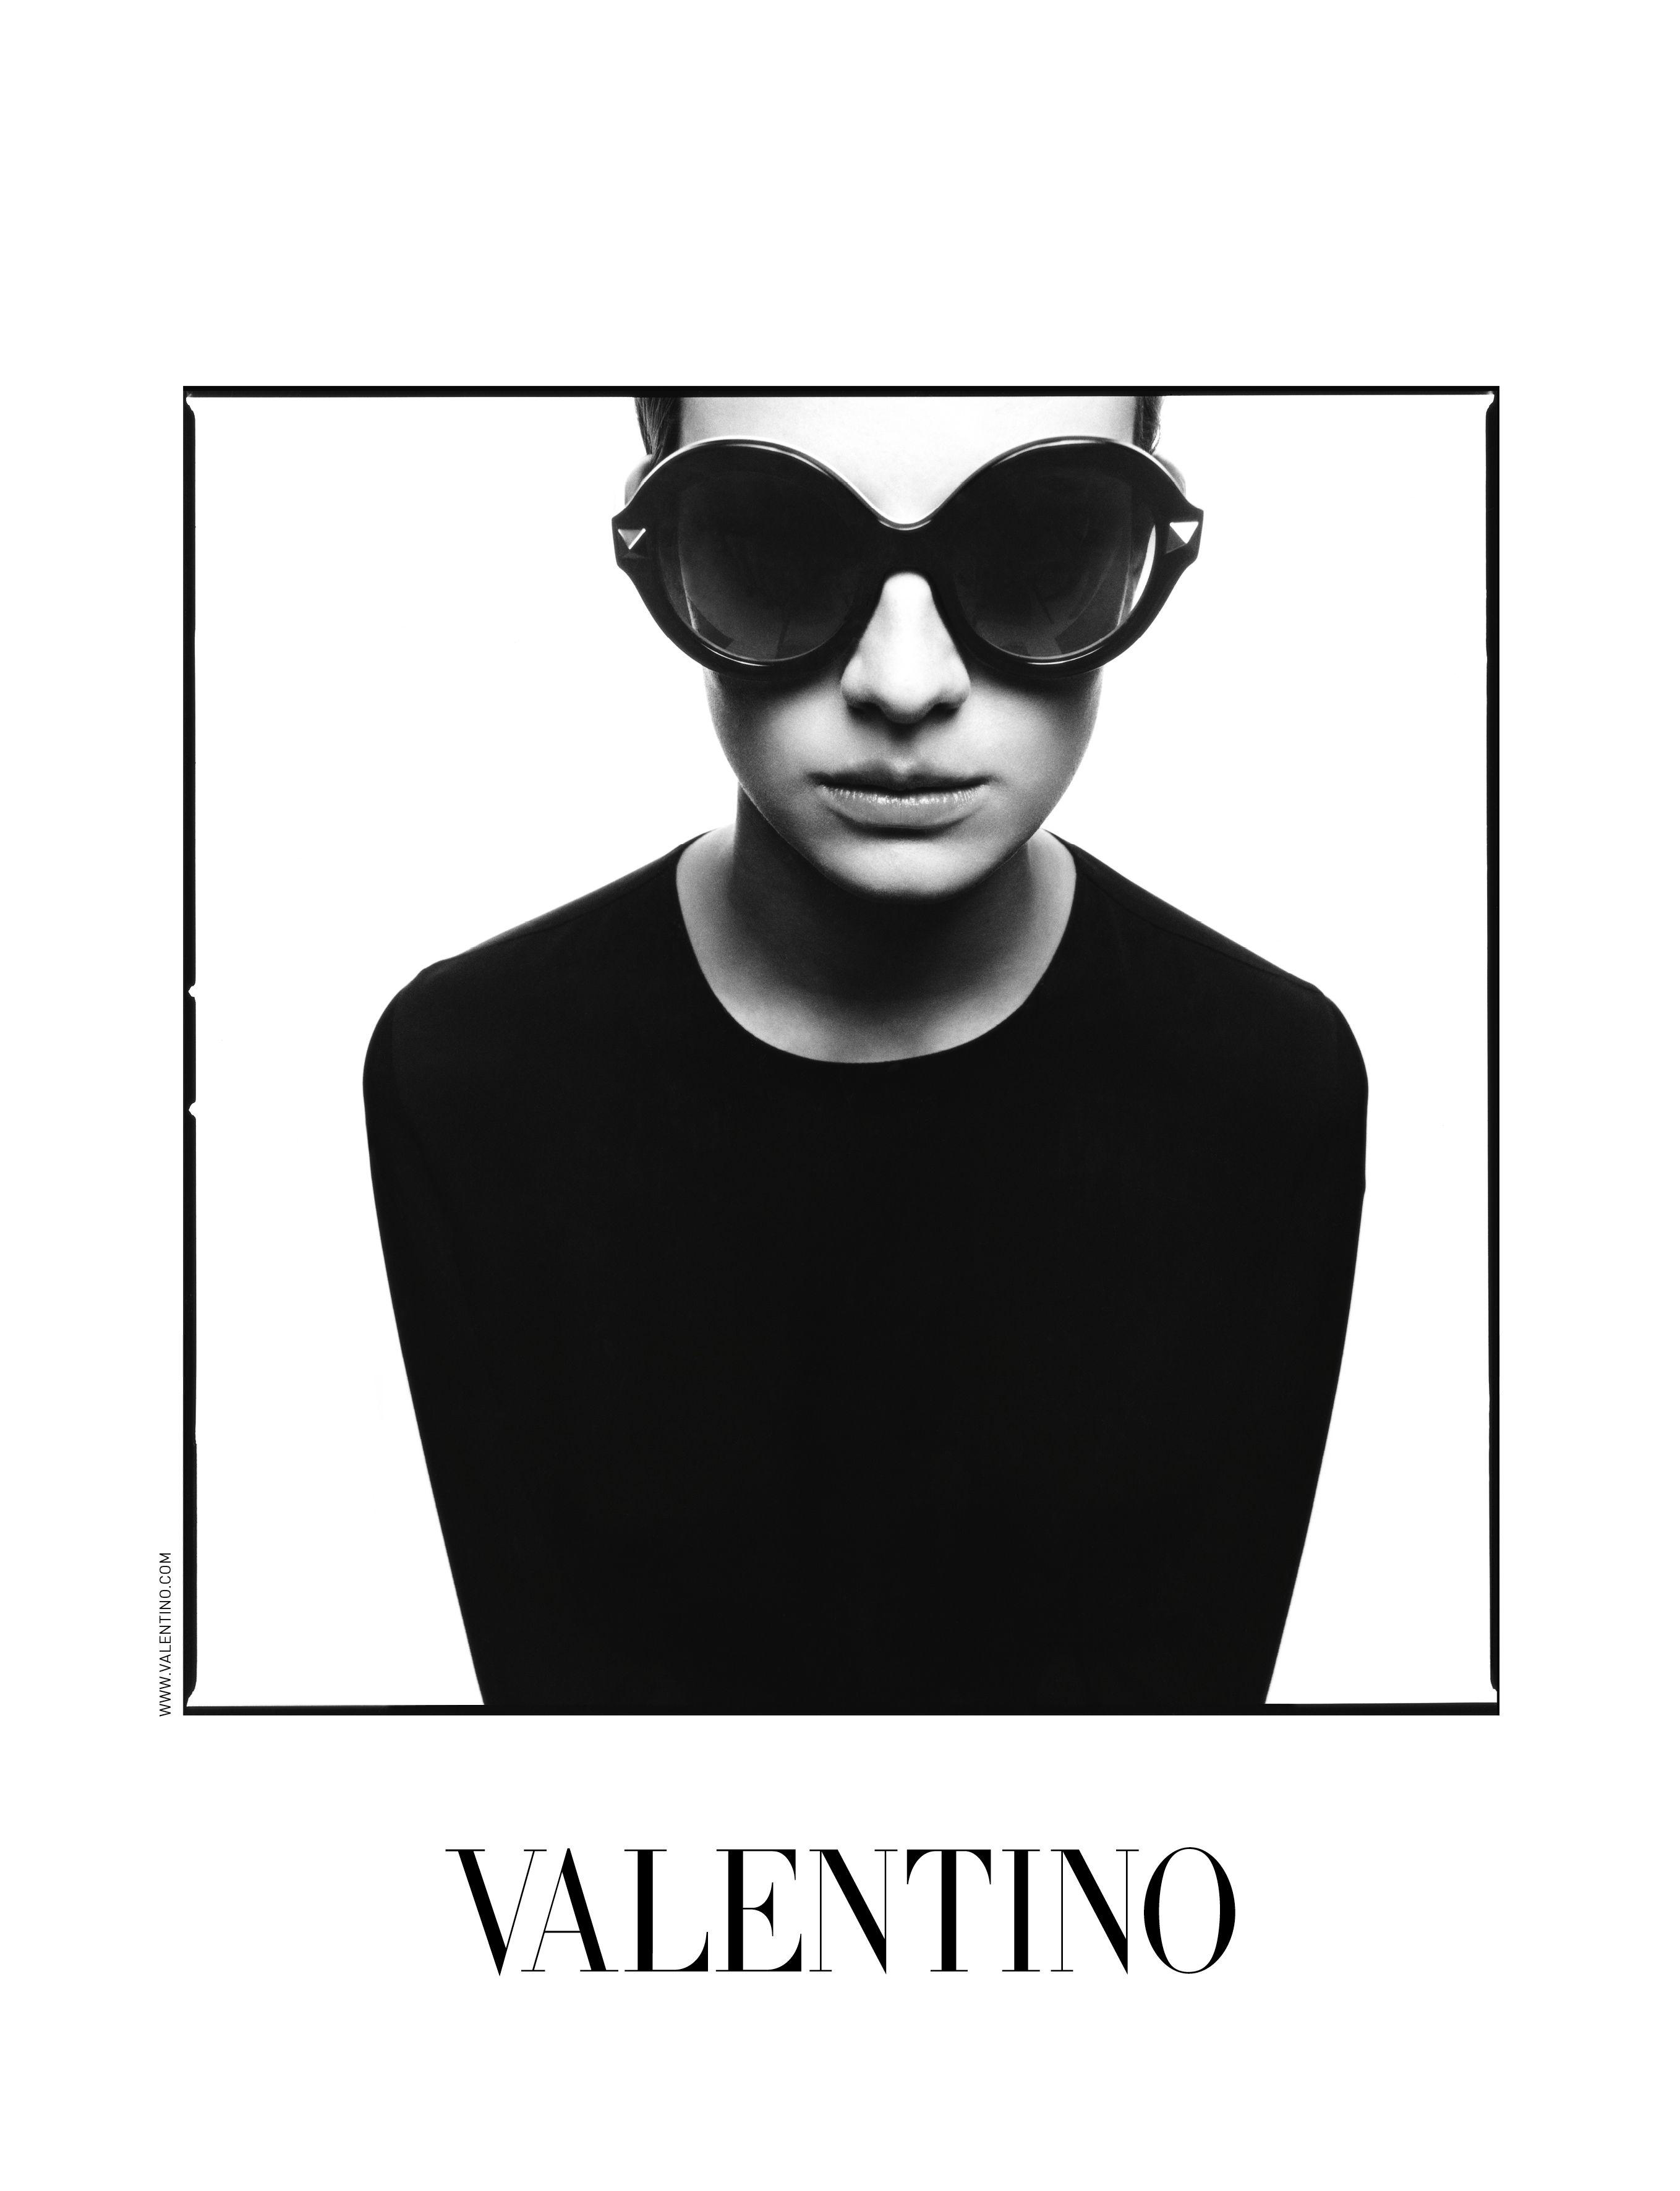 aa8666599e Valentino sunglasses